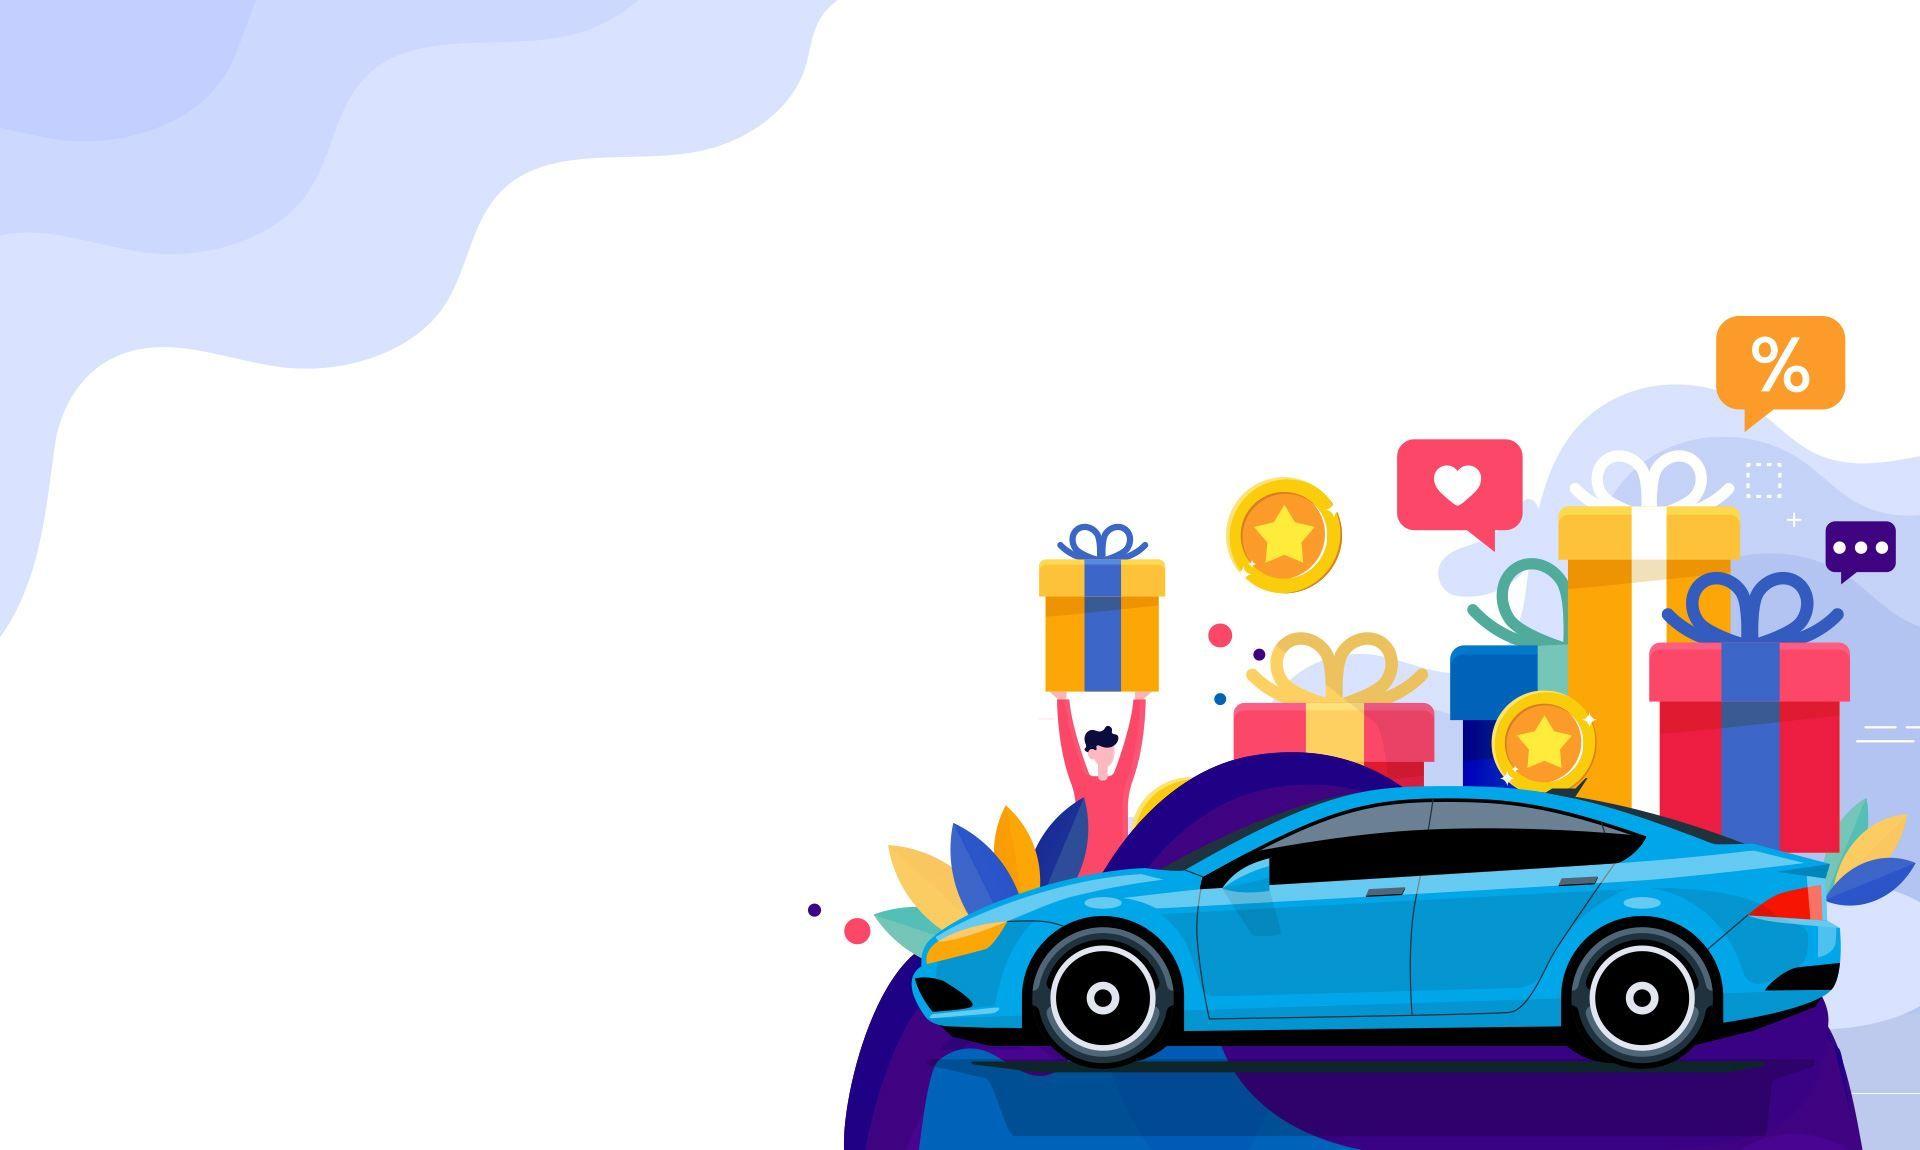 Car Insurance Companies In Dubai Auto Insurance Dubai Car Insurance Dubai Best Car Insurance Best Insurance